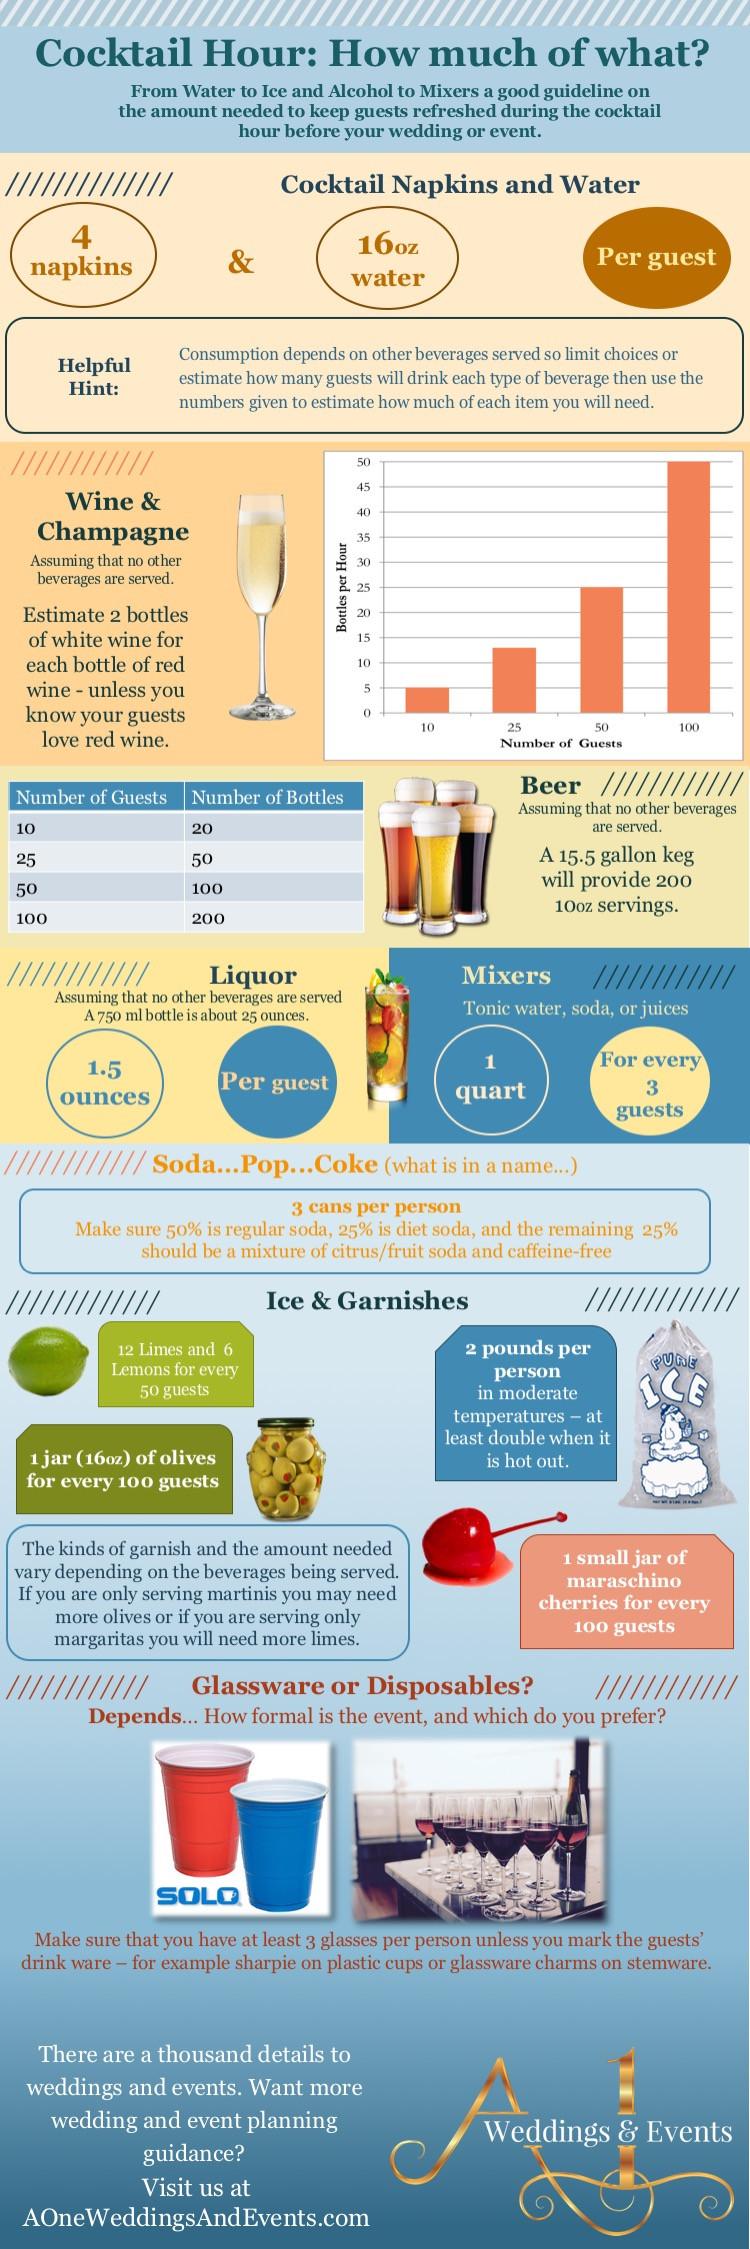 Cocktail hour beverage tips